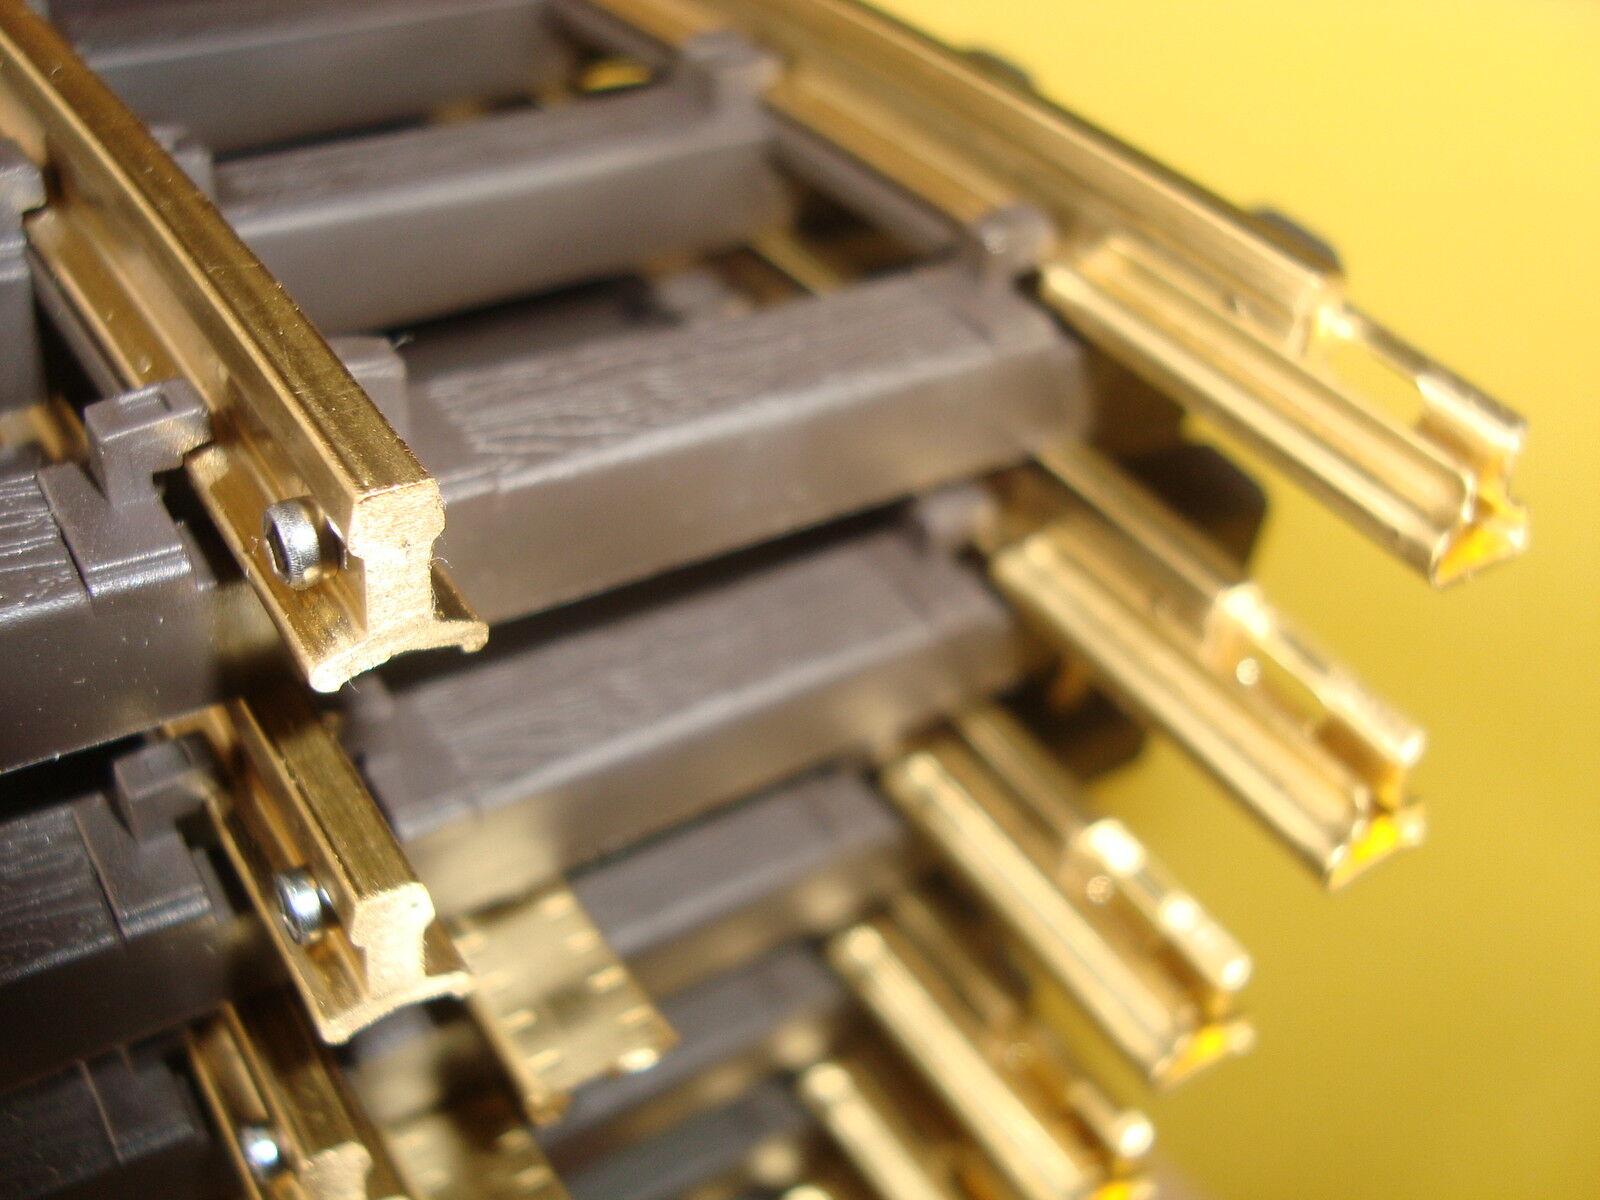 Bachmann G 94653 Nuevo Latón Macizo Rastrear para Exterior Uso 12 Secciones 1.2m